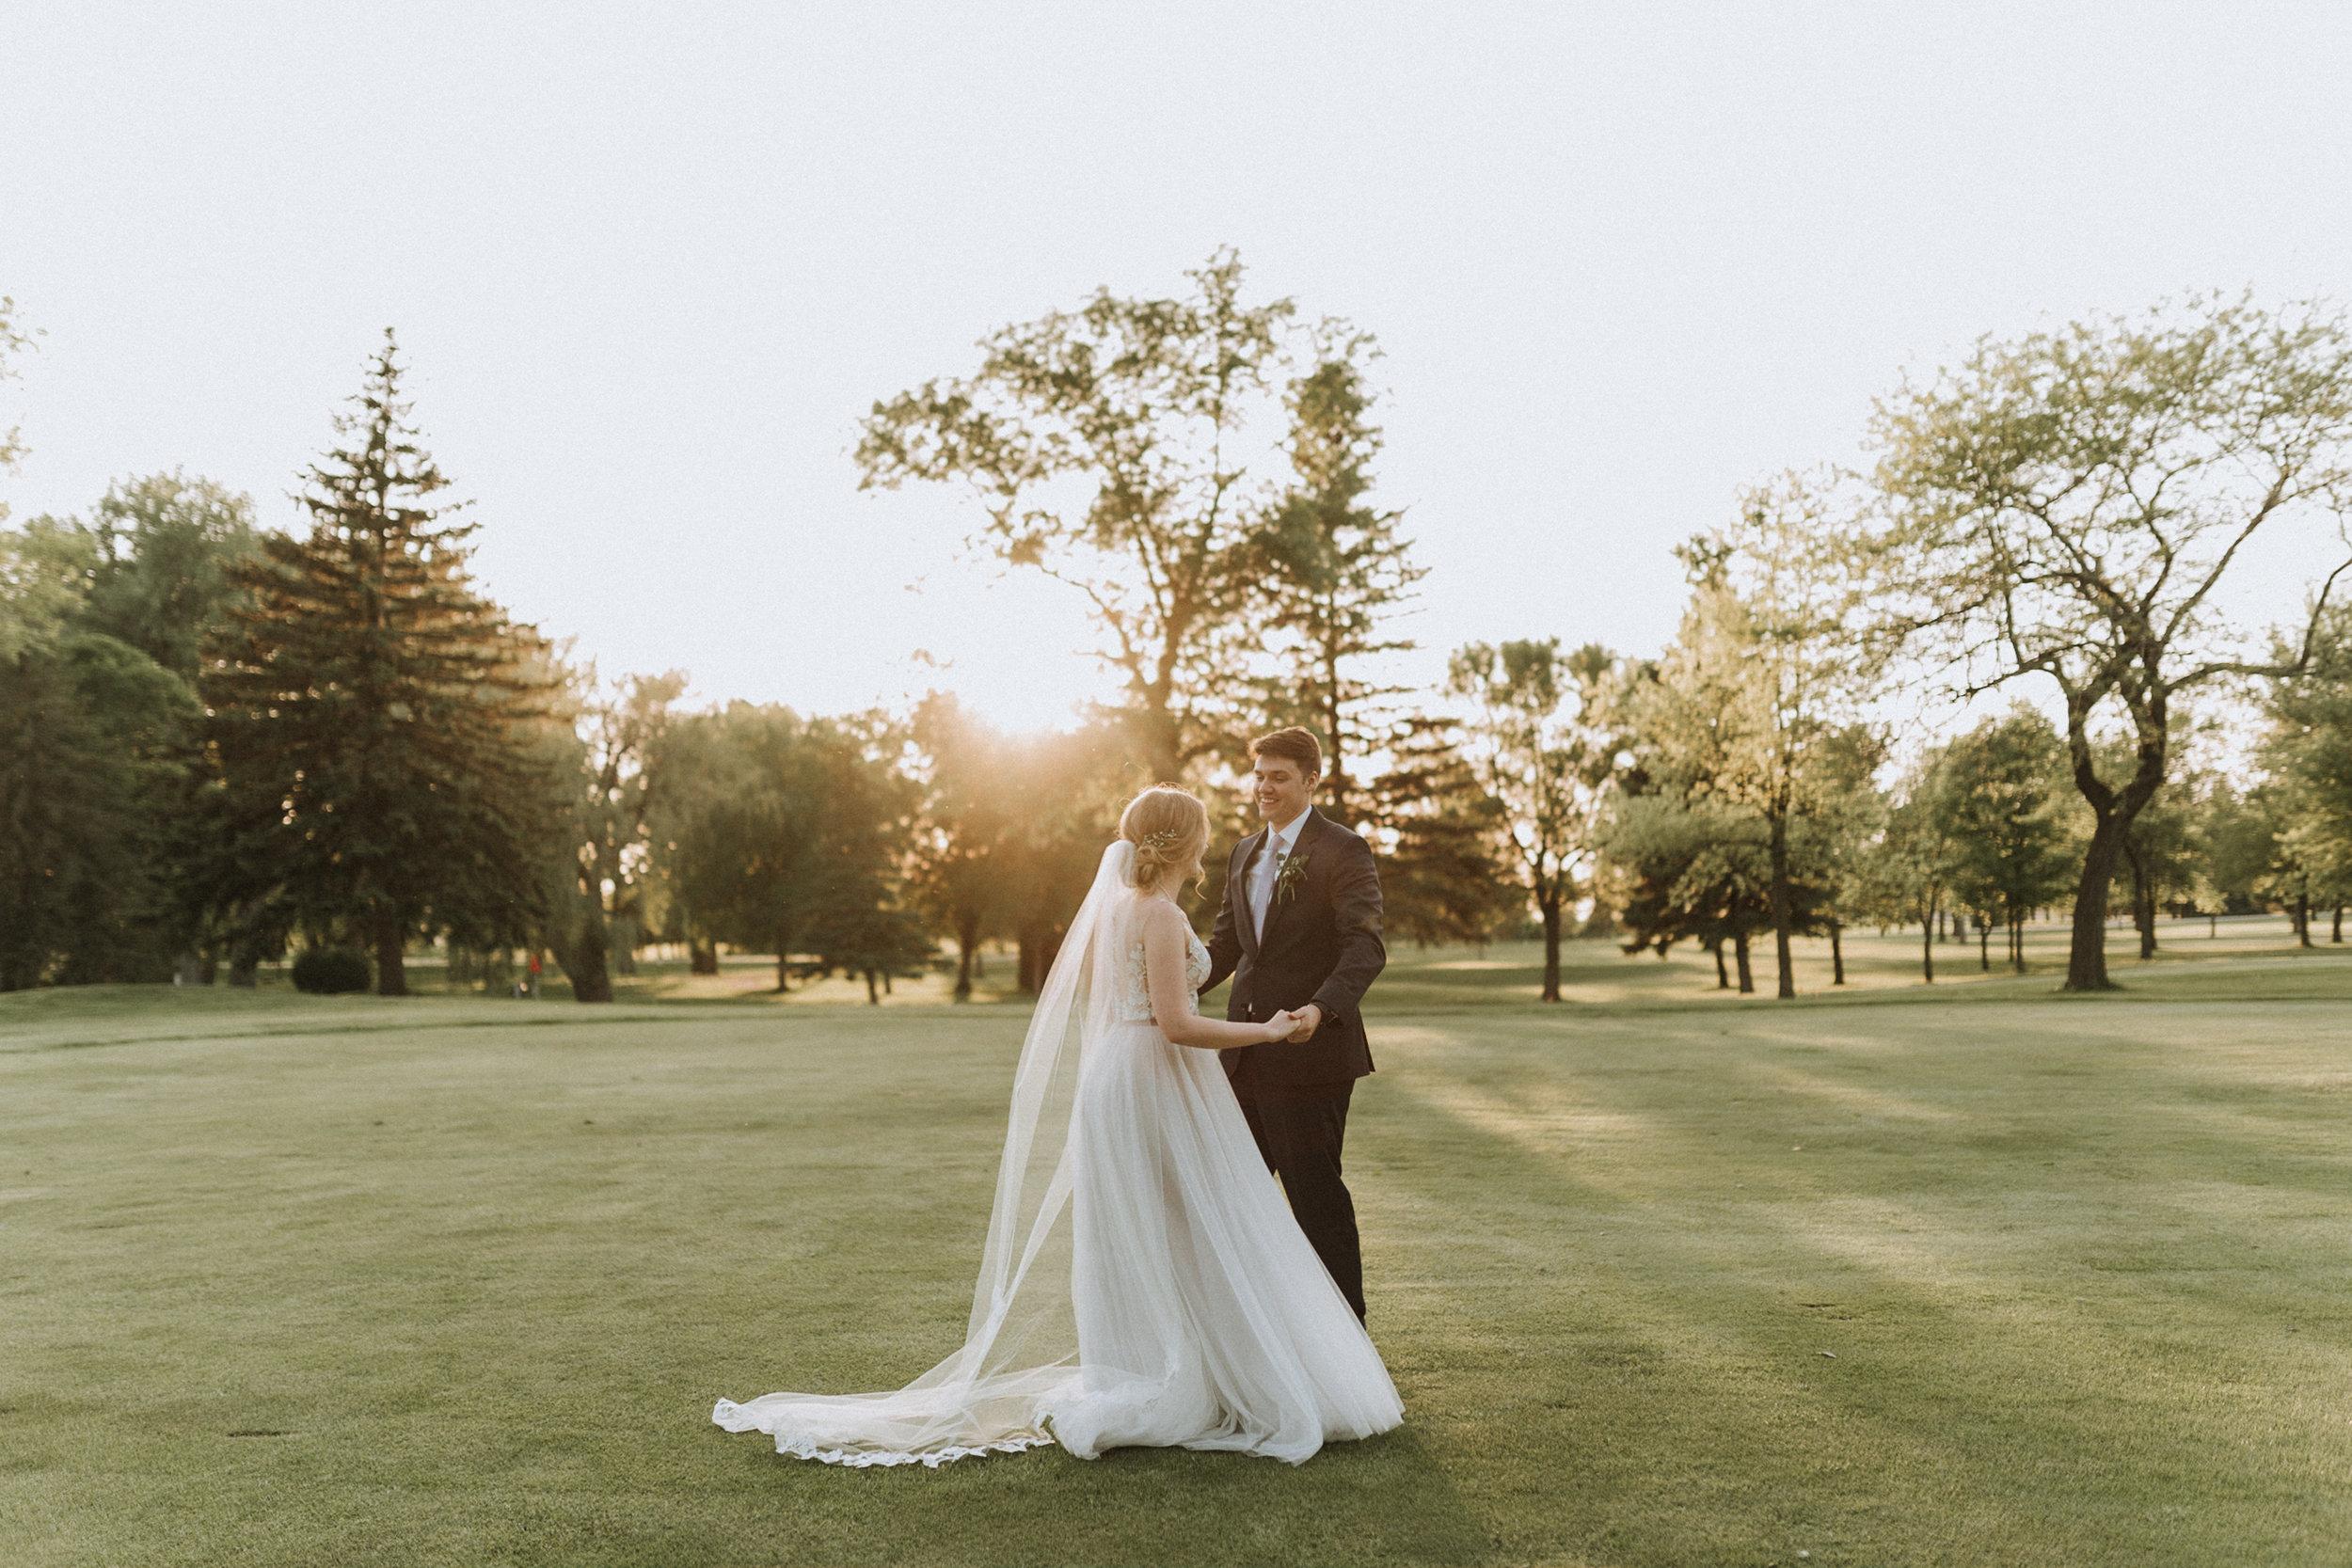 Wedding_(9_of_10).jpg